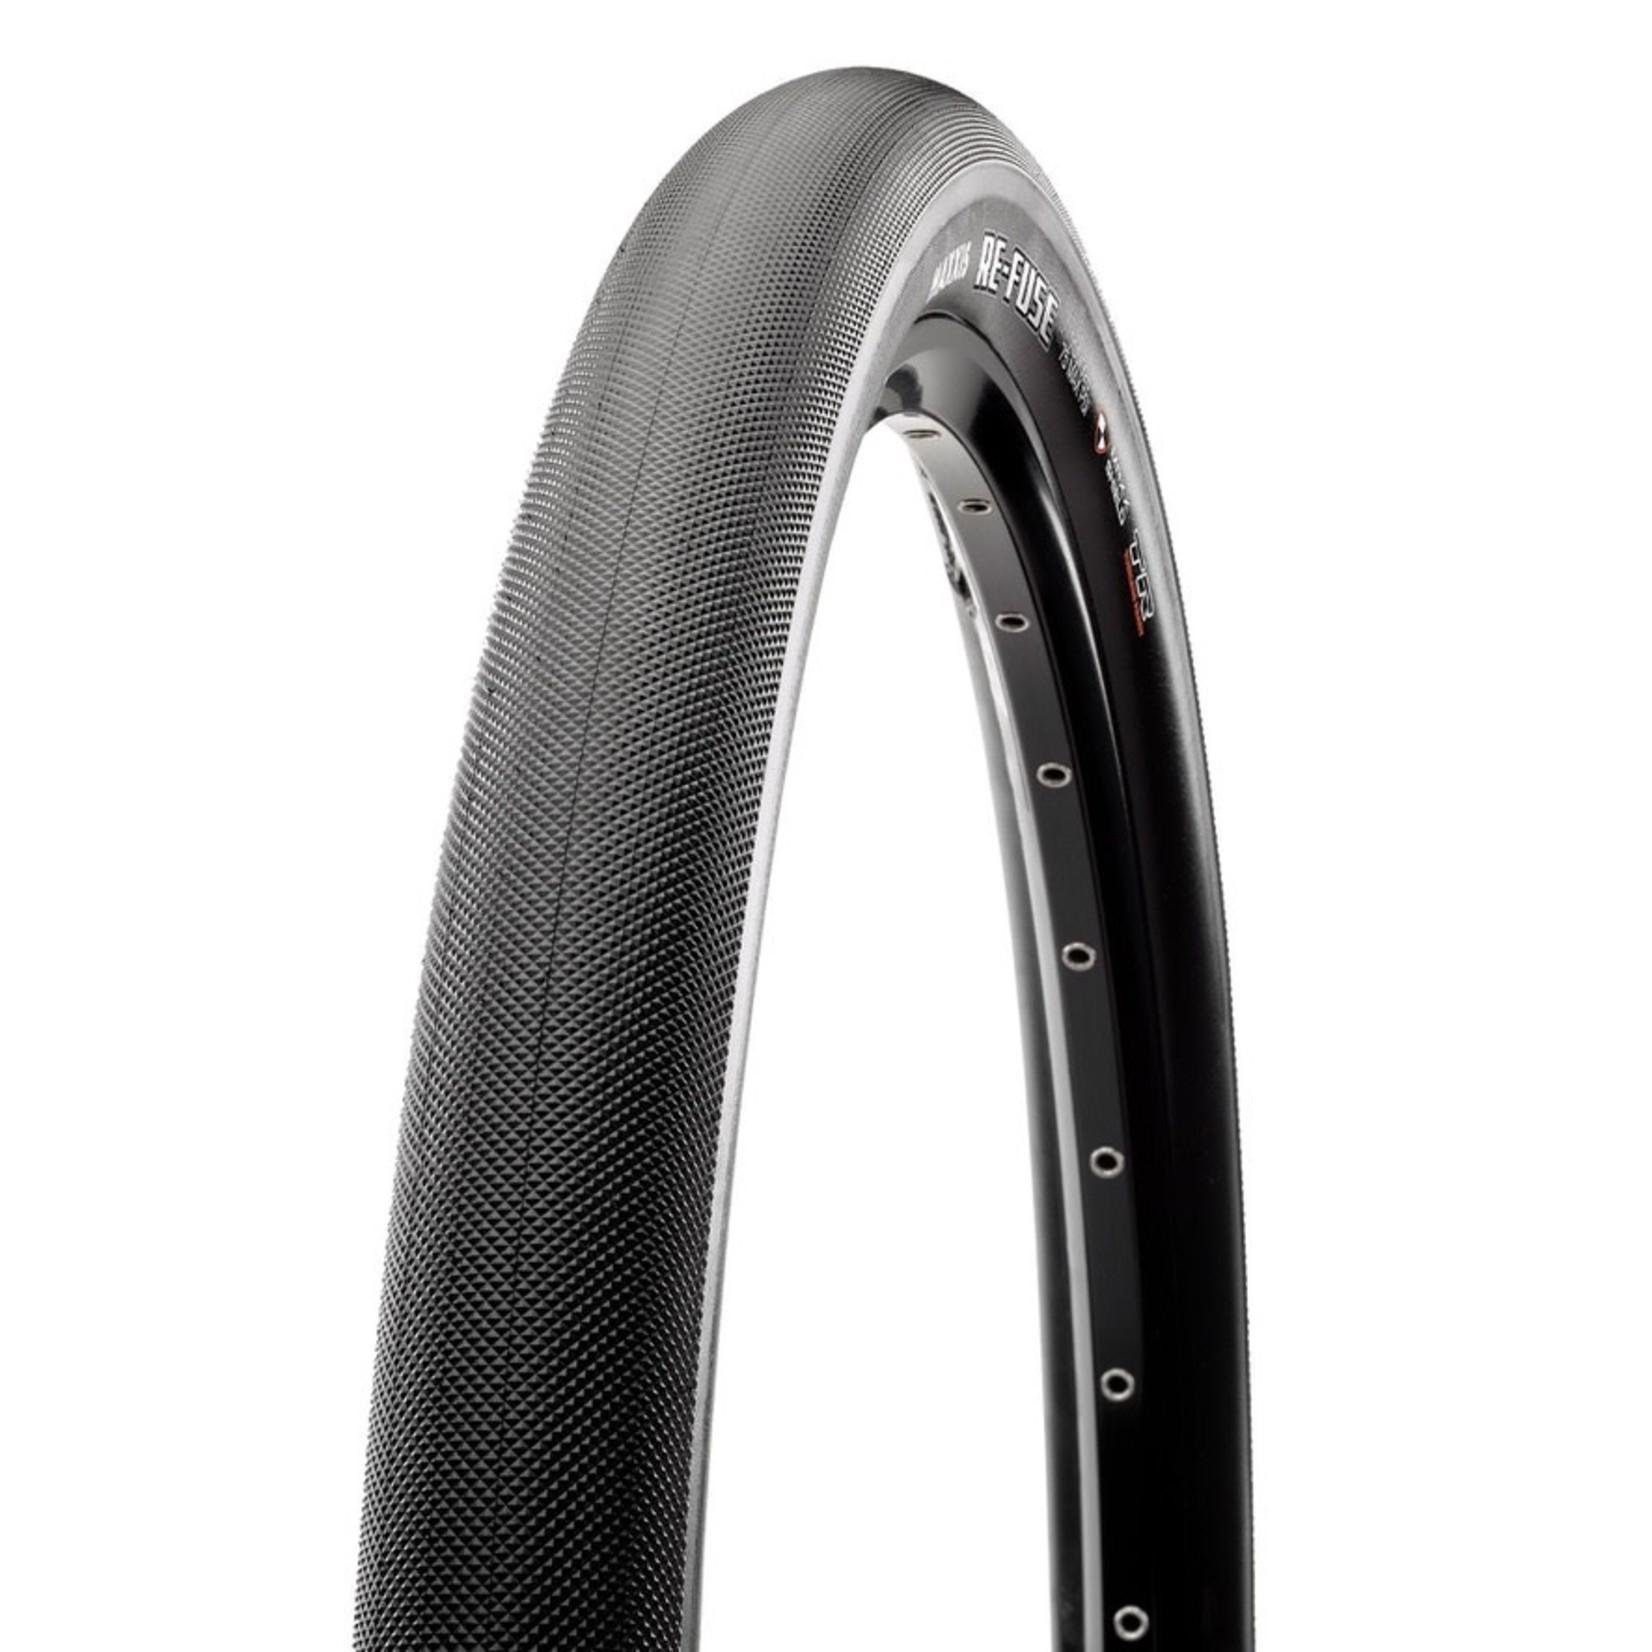 Maxxis Maxxis, Re-Fuse 27.5'', Tire, 650Bx47C, Folding, Tubeless Ready, Dual, MaxxShield, 60TPI, Black